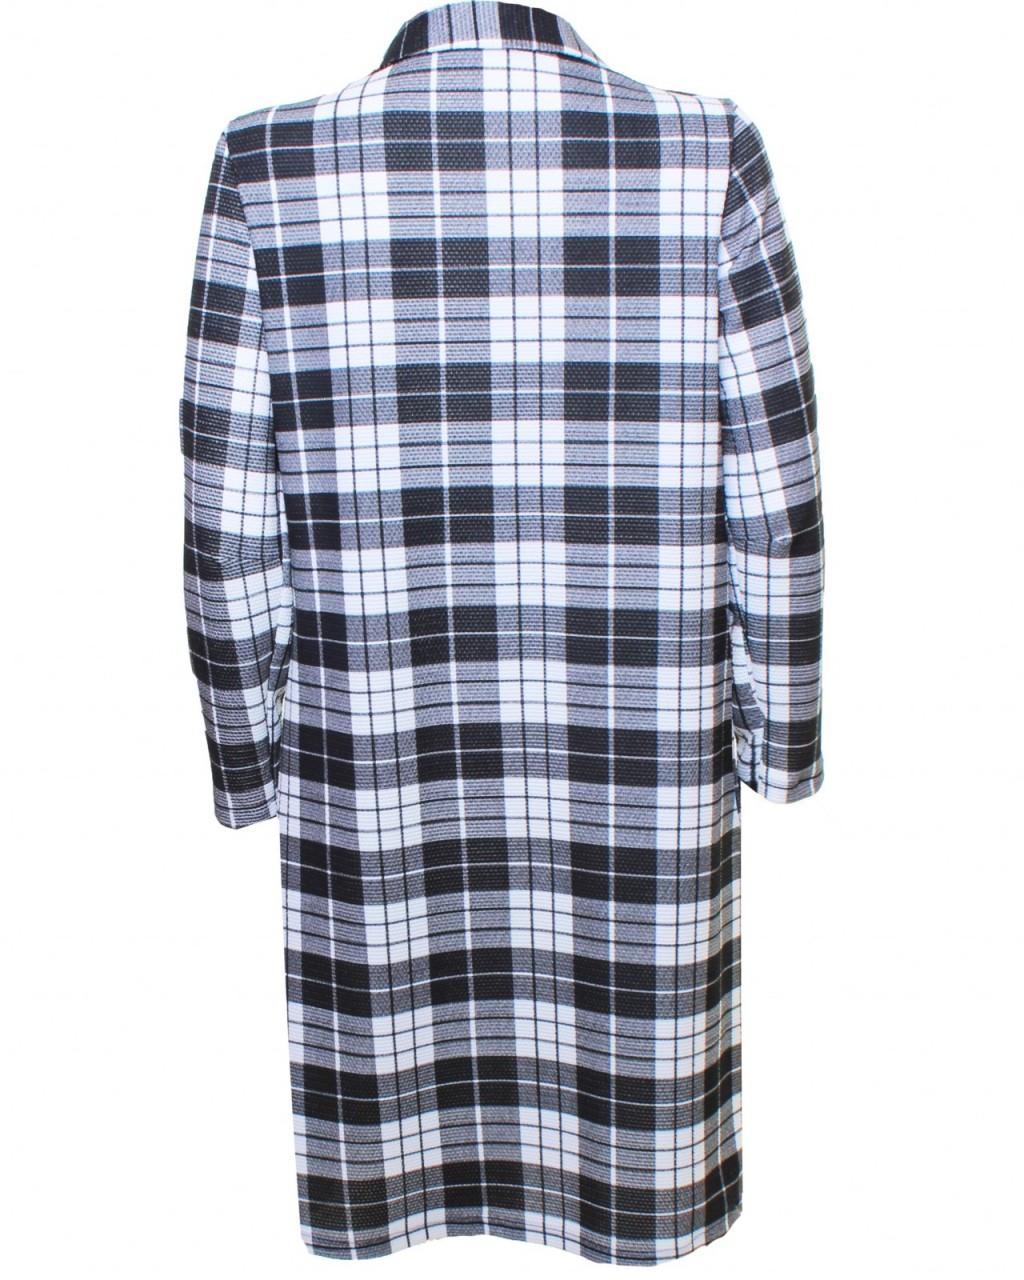 LOVE Black & White Tartan Long Jacket